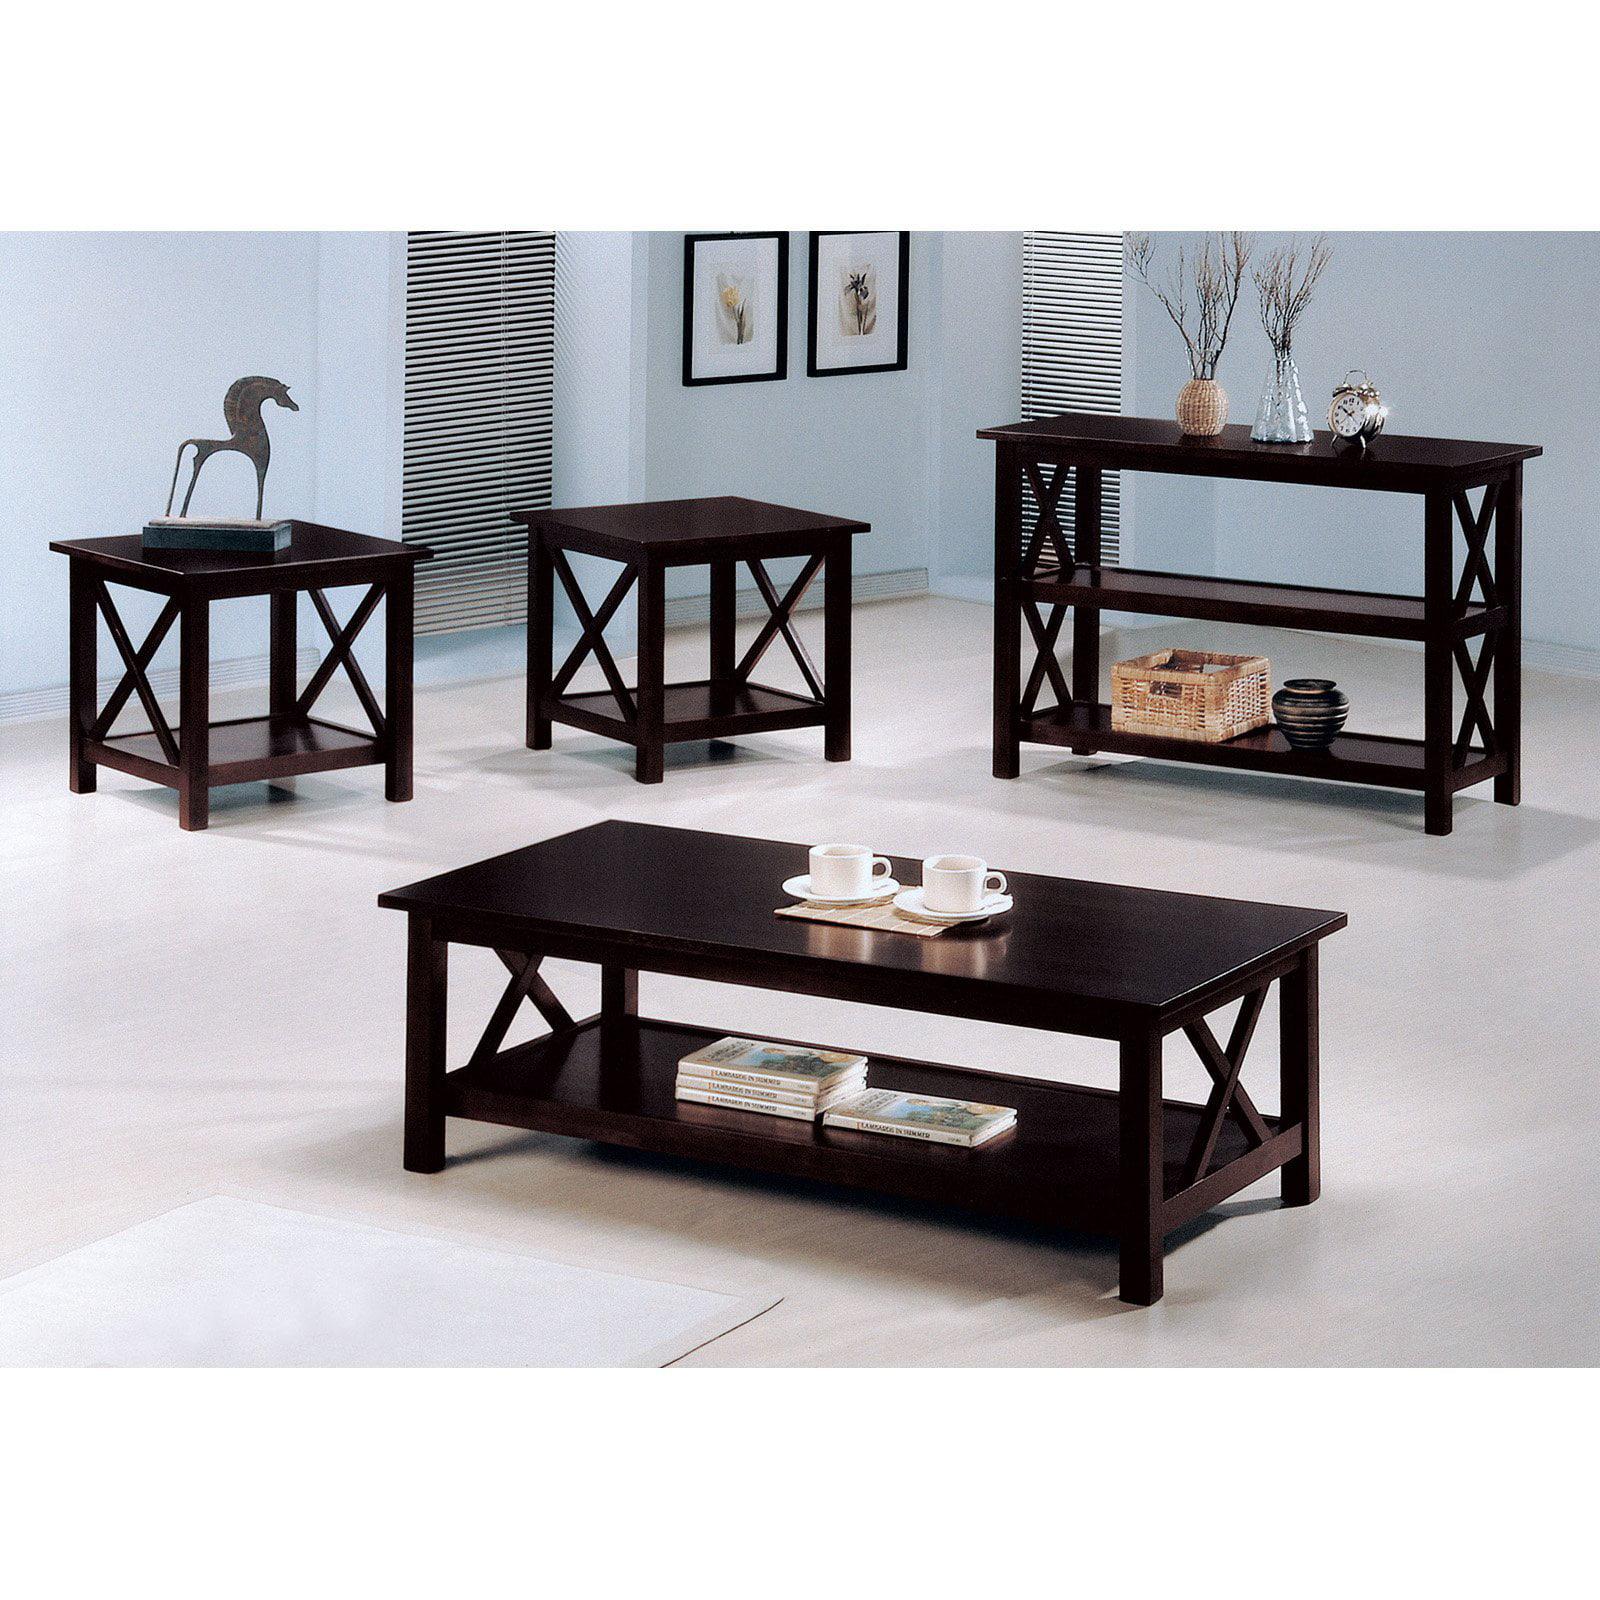 Coaster Furniture 3 Piece Coffee Table Set Dark Merlot Walmart